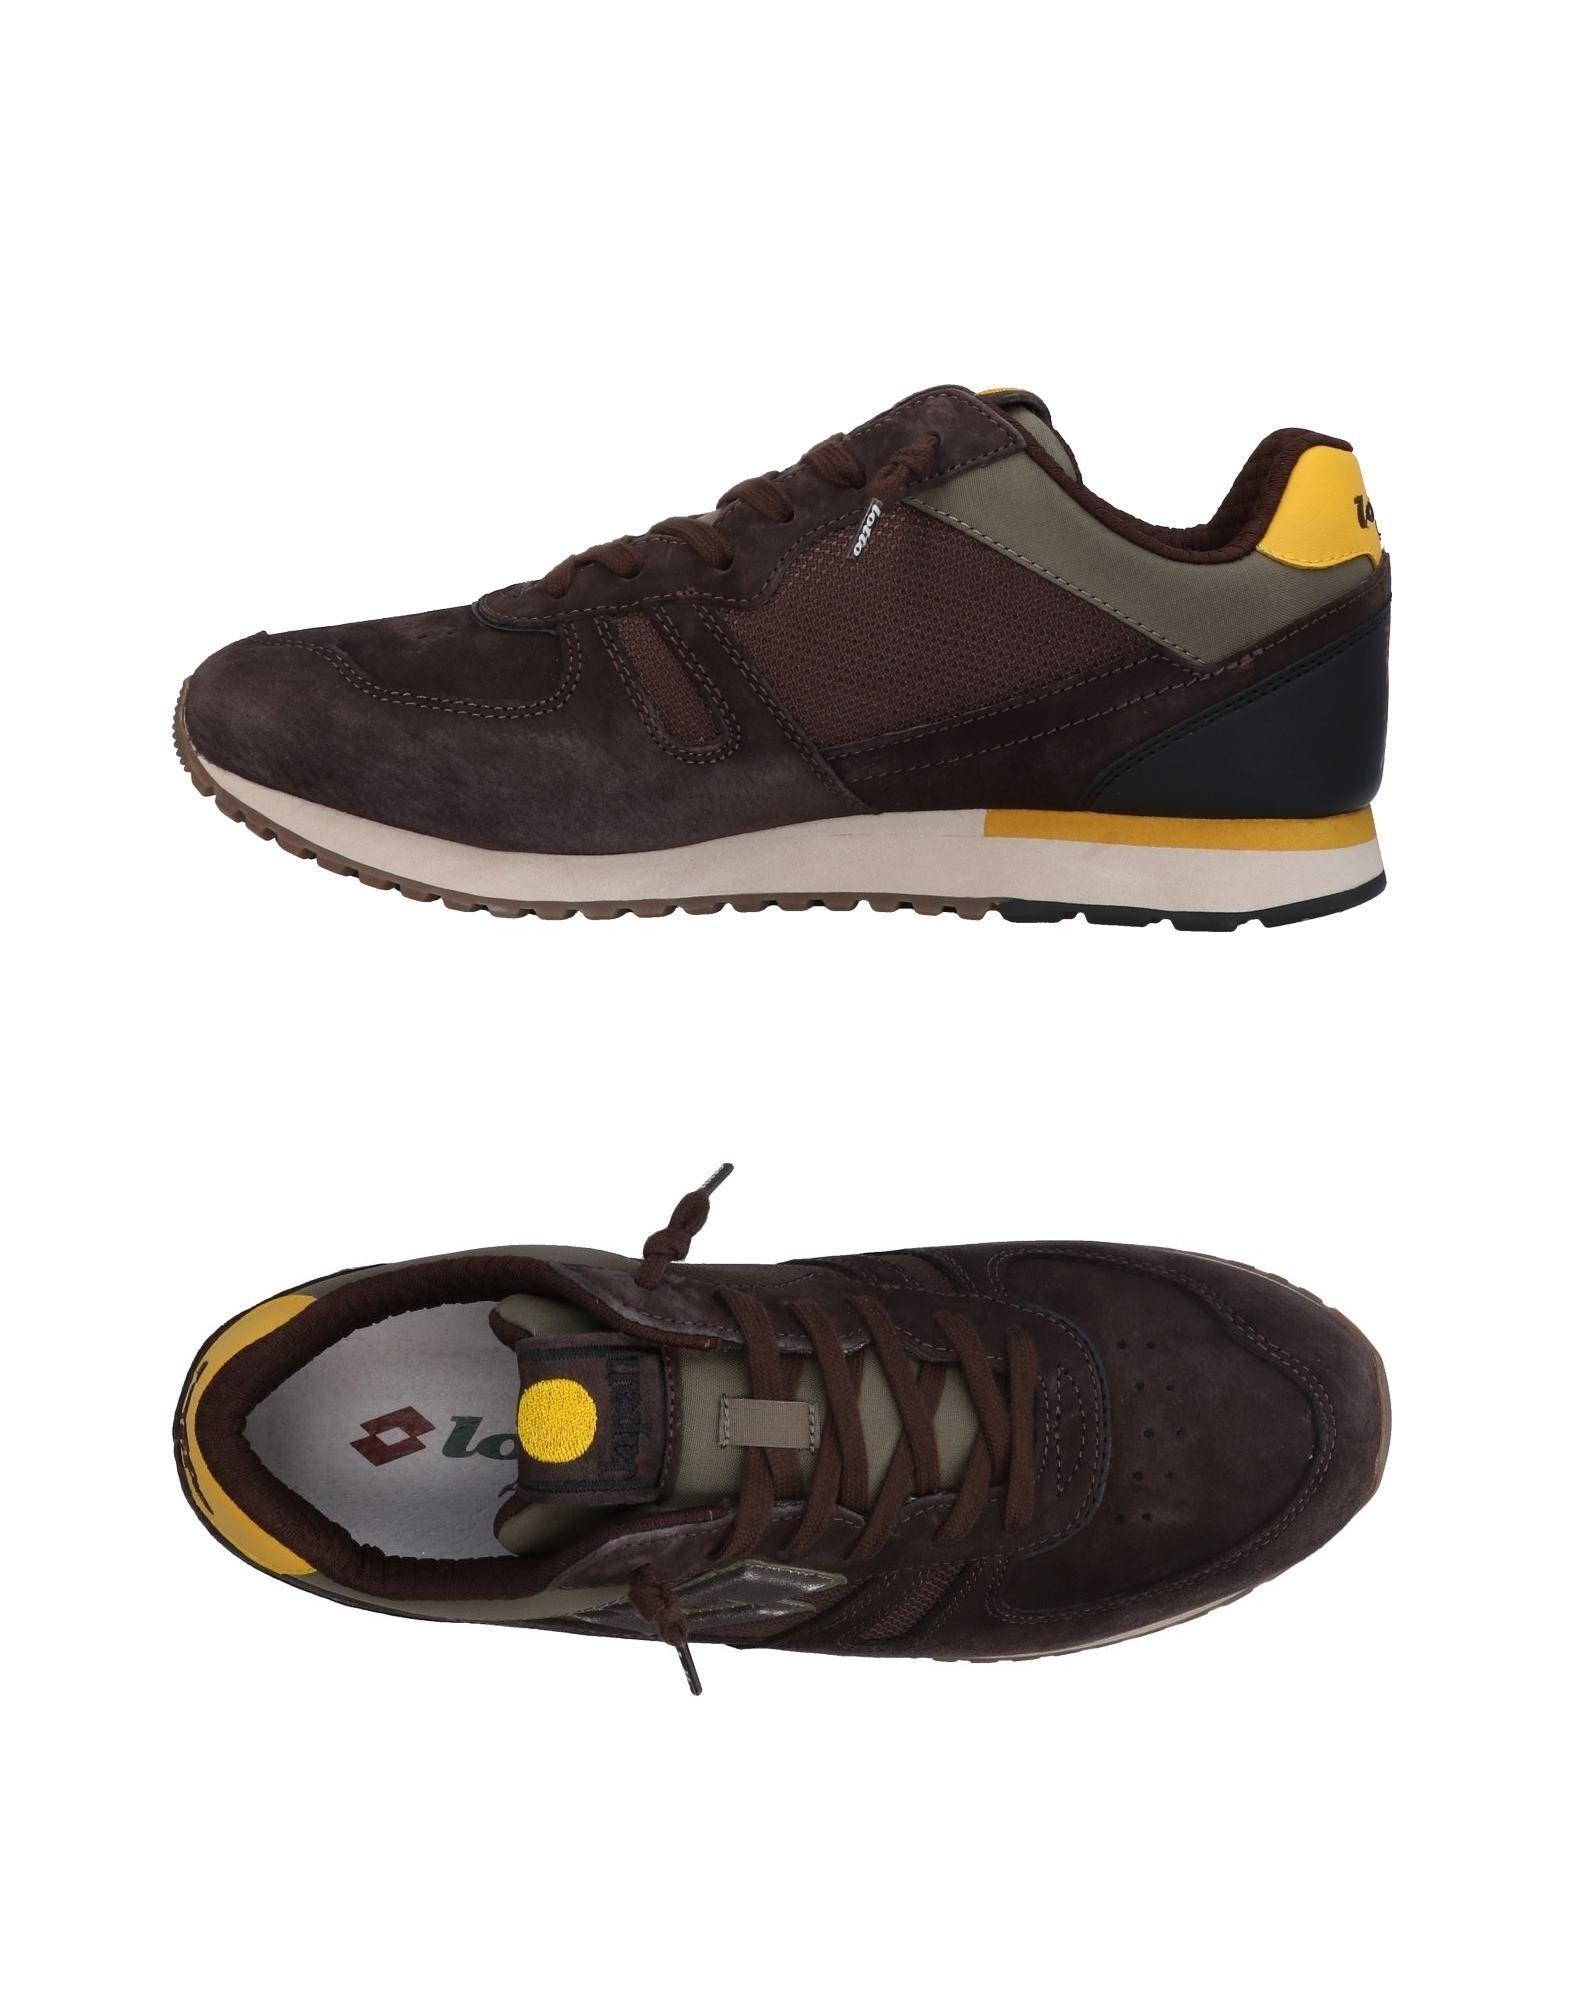 Sneakers Lotto Leggenda Homme - Sneakers Lotto Leggenda sur